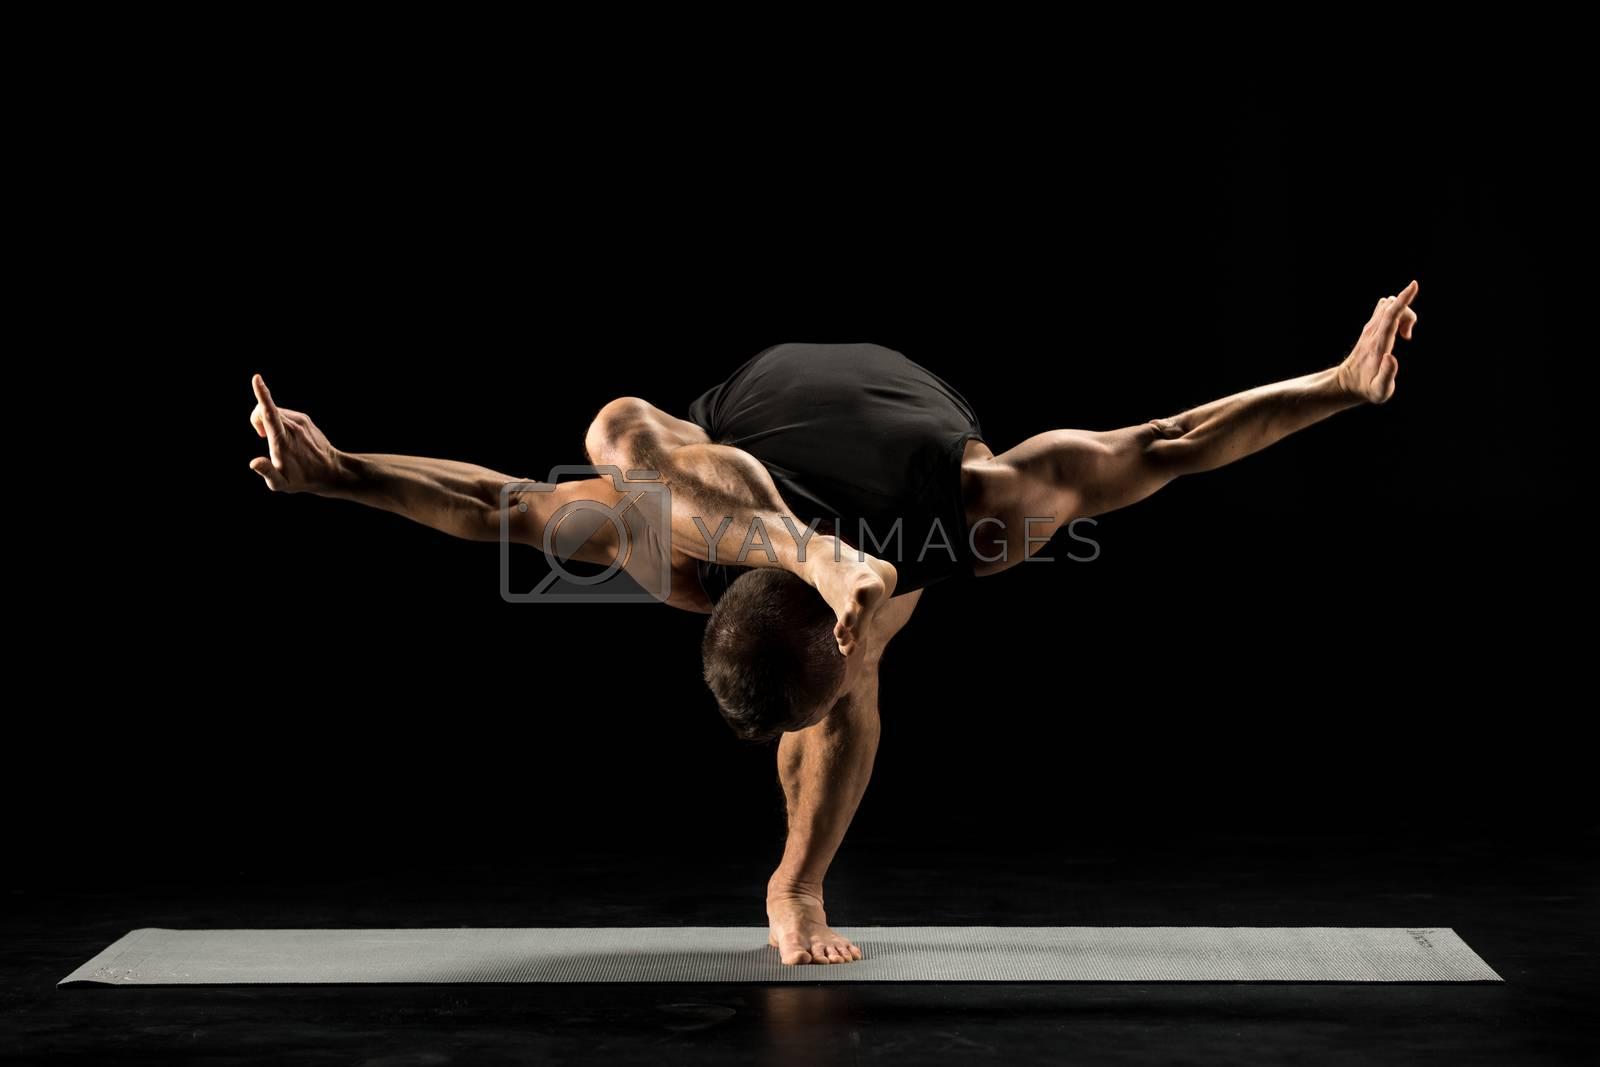 Man performing Pada Sirsasana on yoga mat